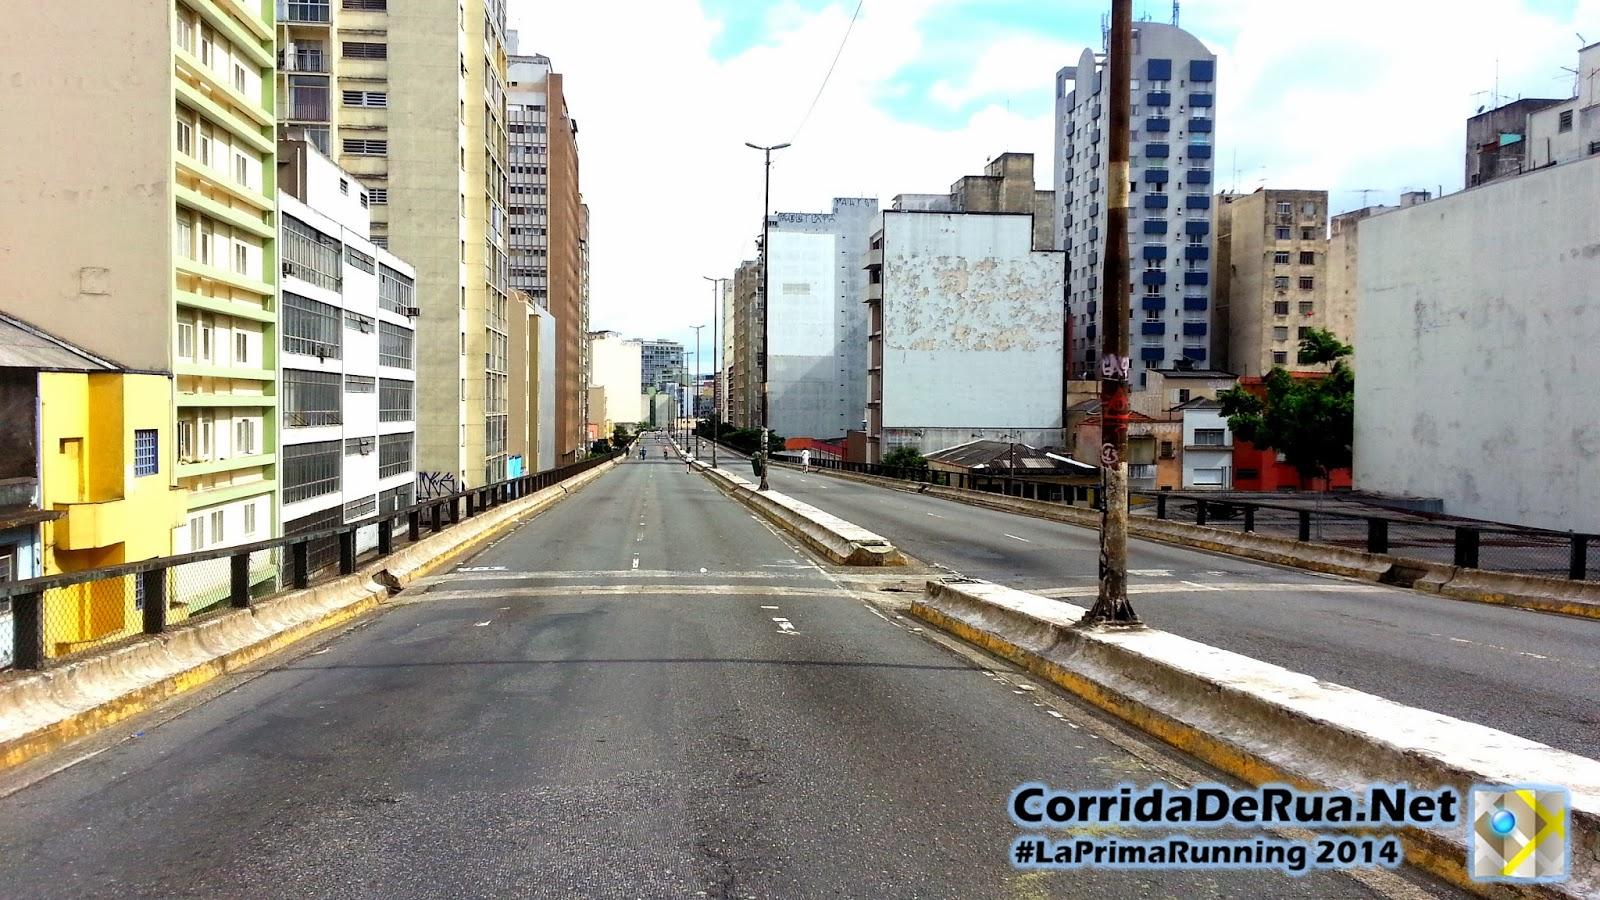 Elevado Costa e Silva - Corrida De Rua